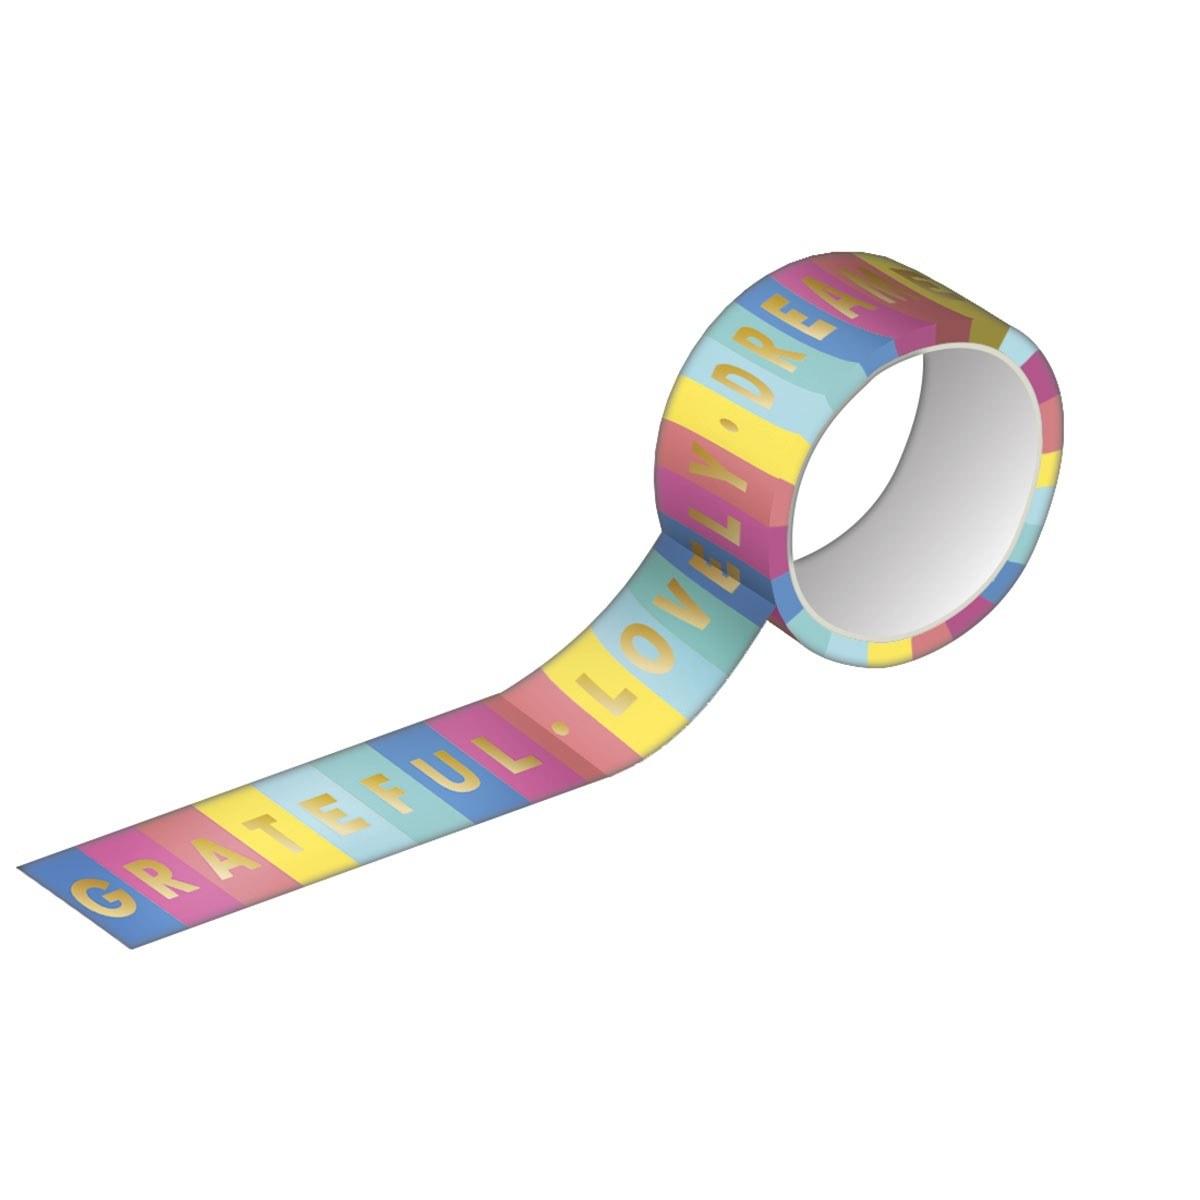 Fita Adesiva Washi Tape 15mmX10m Estampada e Metalizada - Tilibra